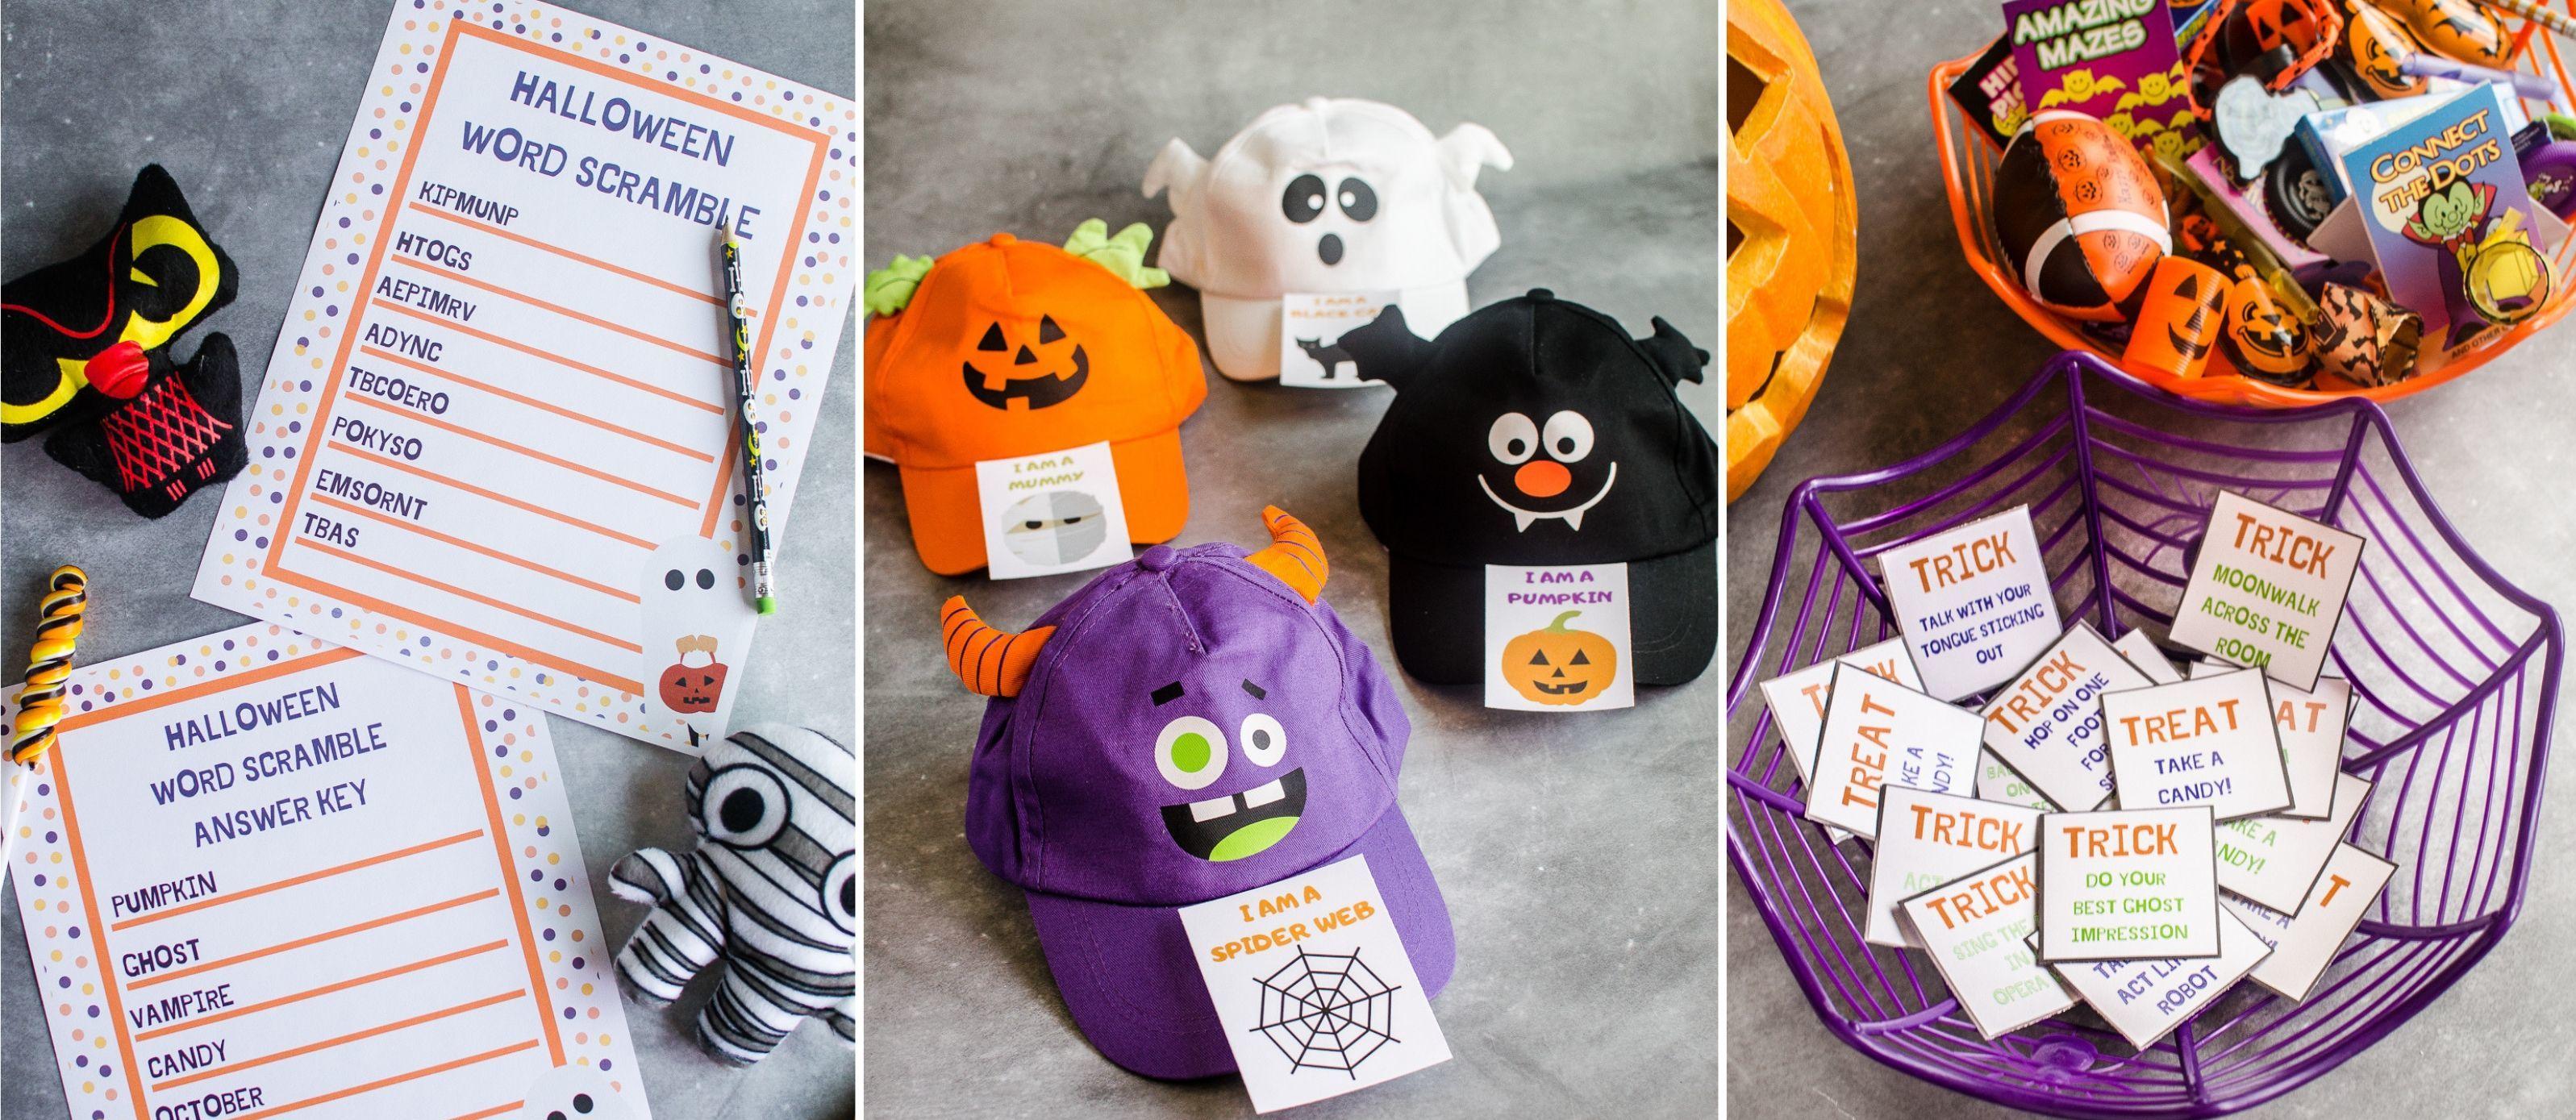 11 Super Fun Halloween Games for Kids